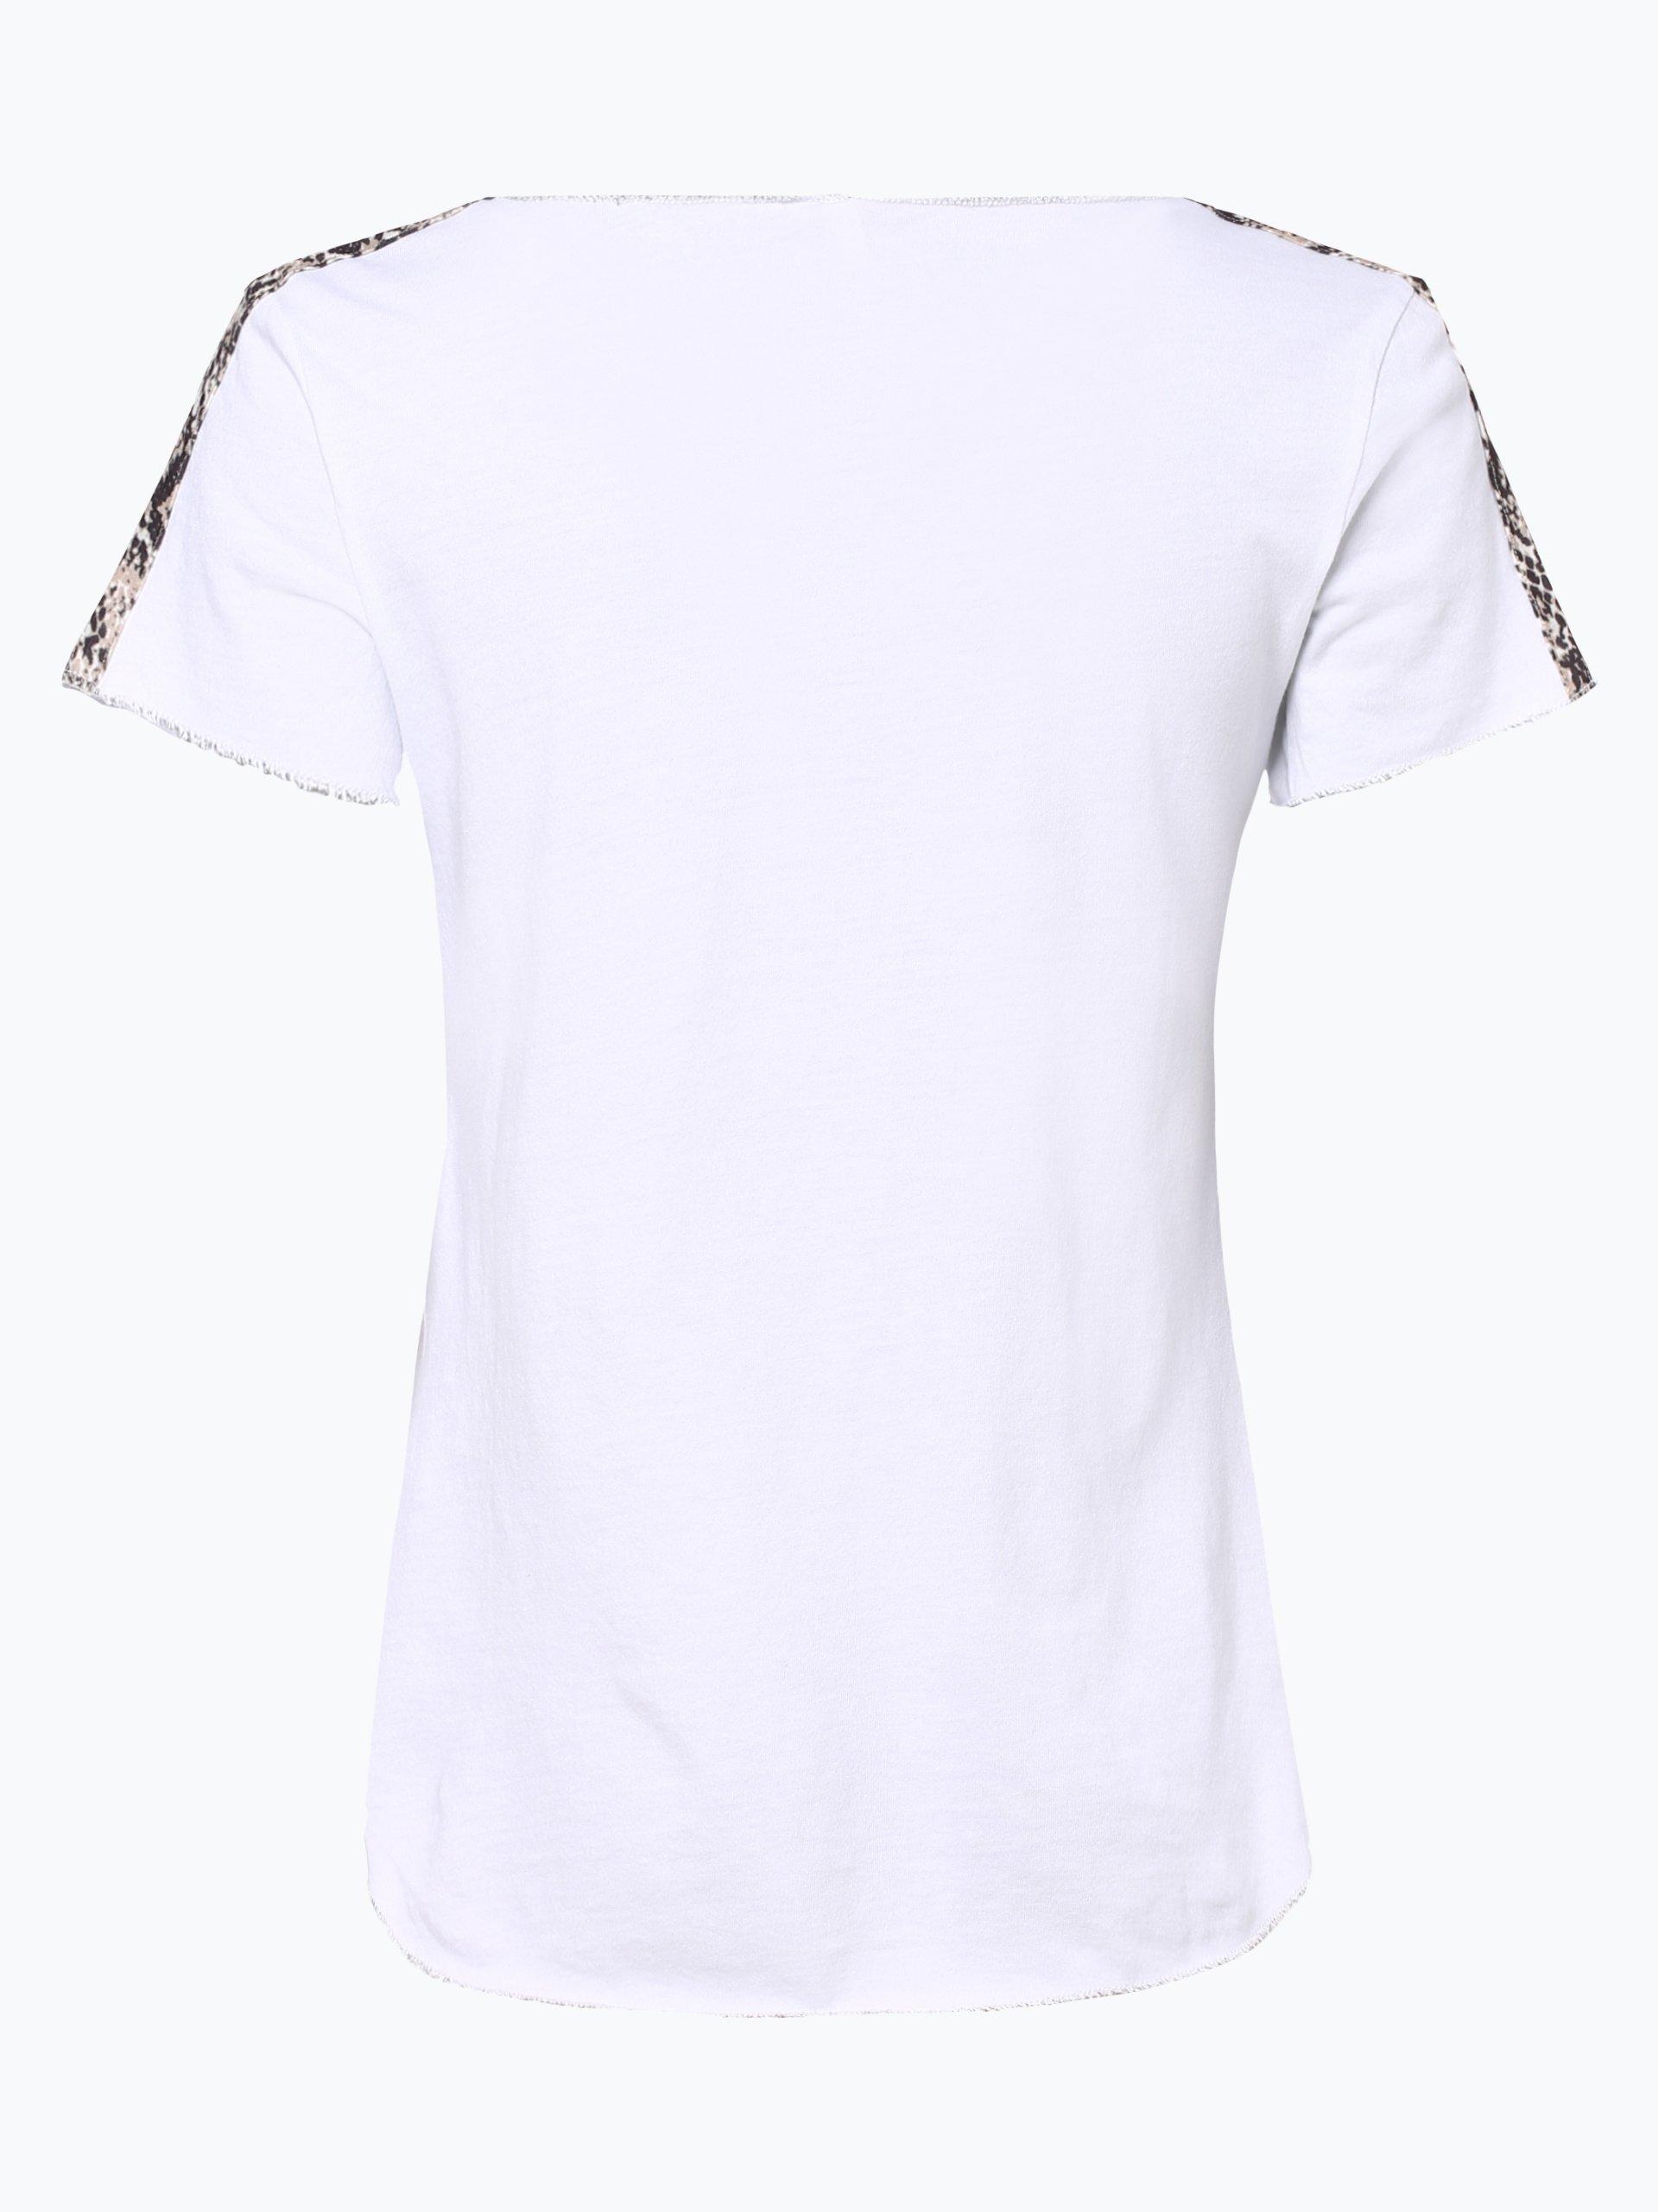 Key Largo Damen T-Shirt - Emilia